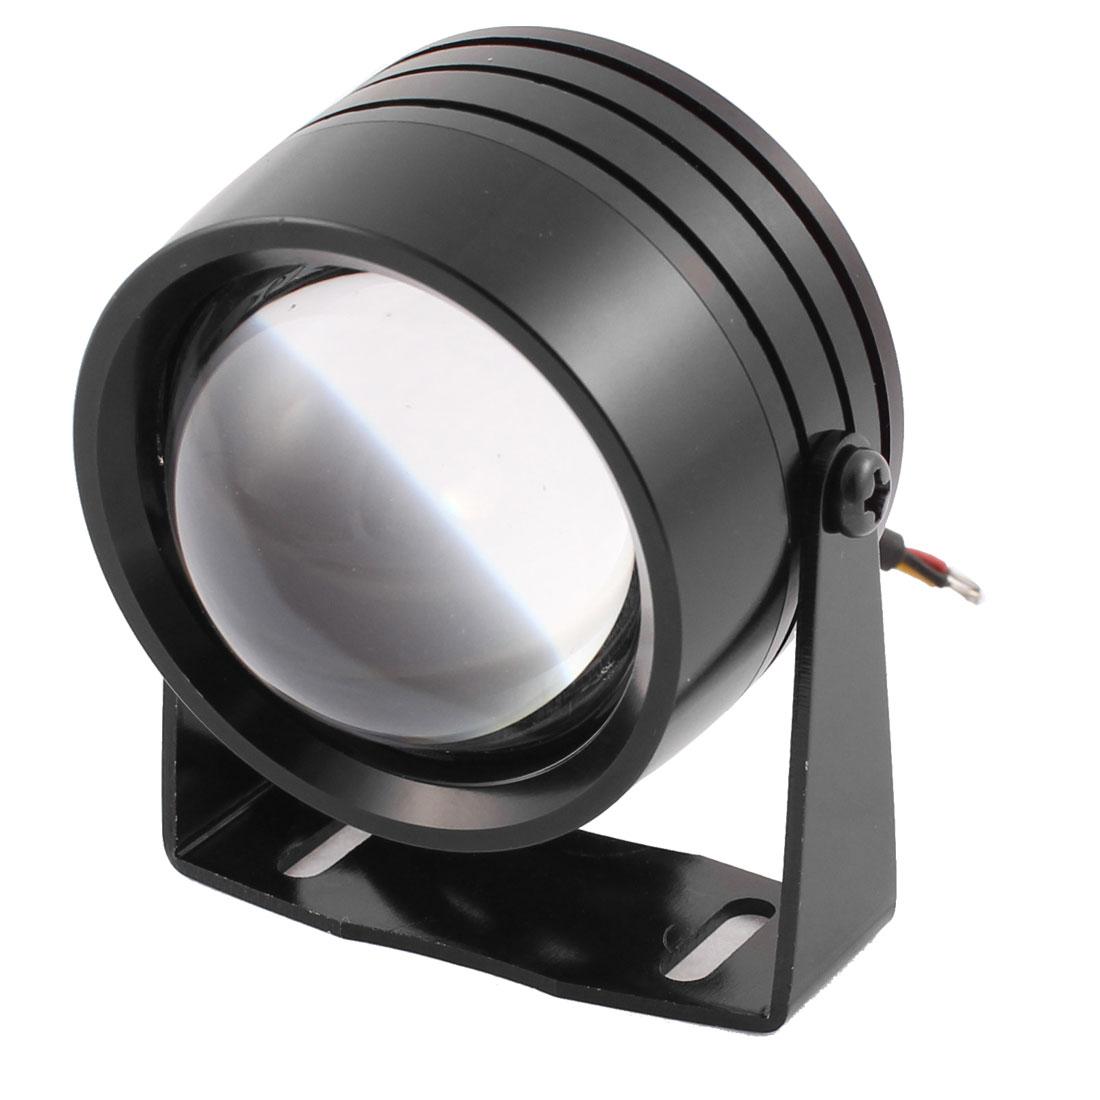 Motorcycle Black Metal Casing White LED Decoration Spot Light Lamp DC 12V